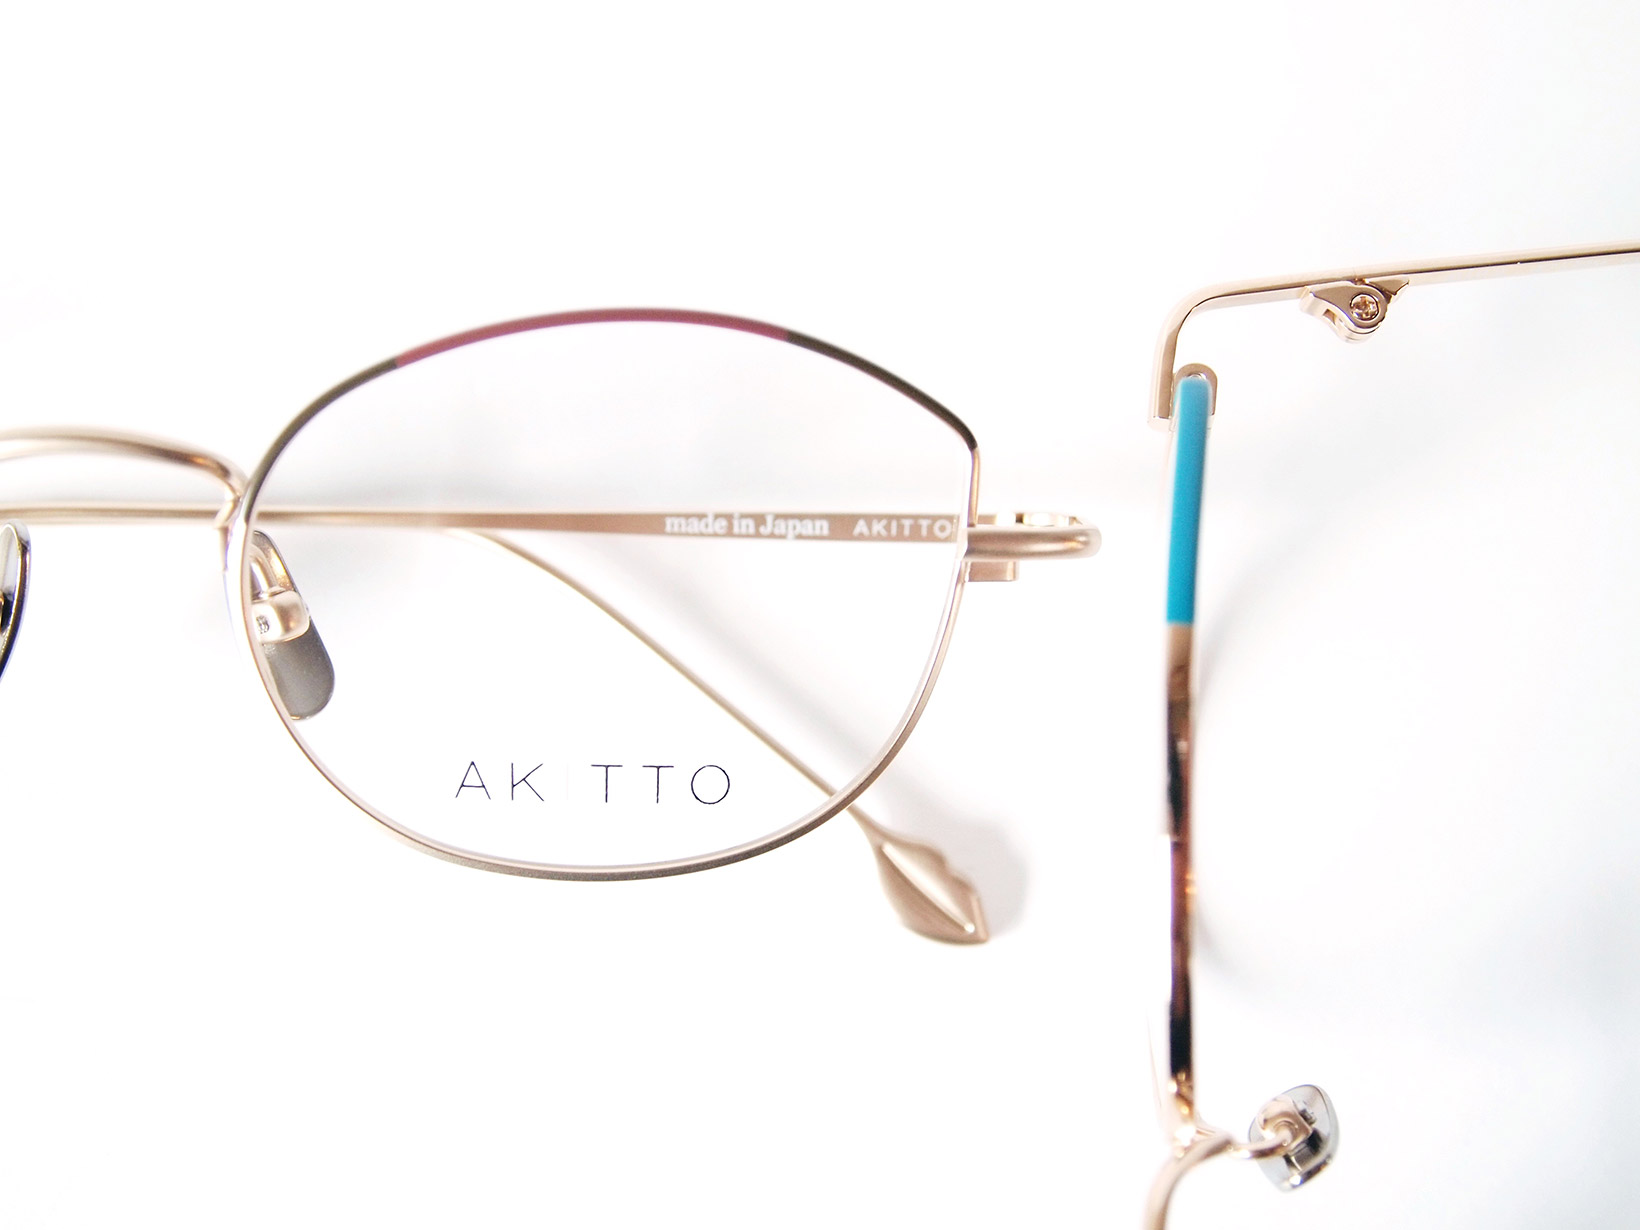 AKITTO 2017-4th pin2 size:47□20 material:titanium price:¥42,000-(+tax)